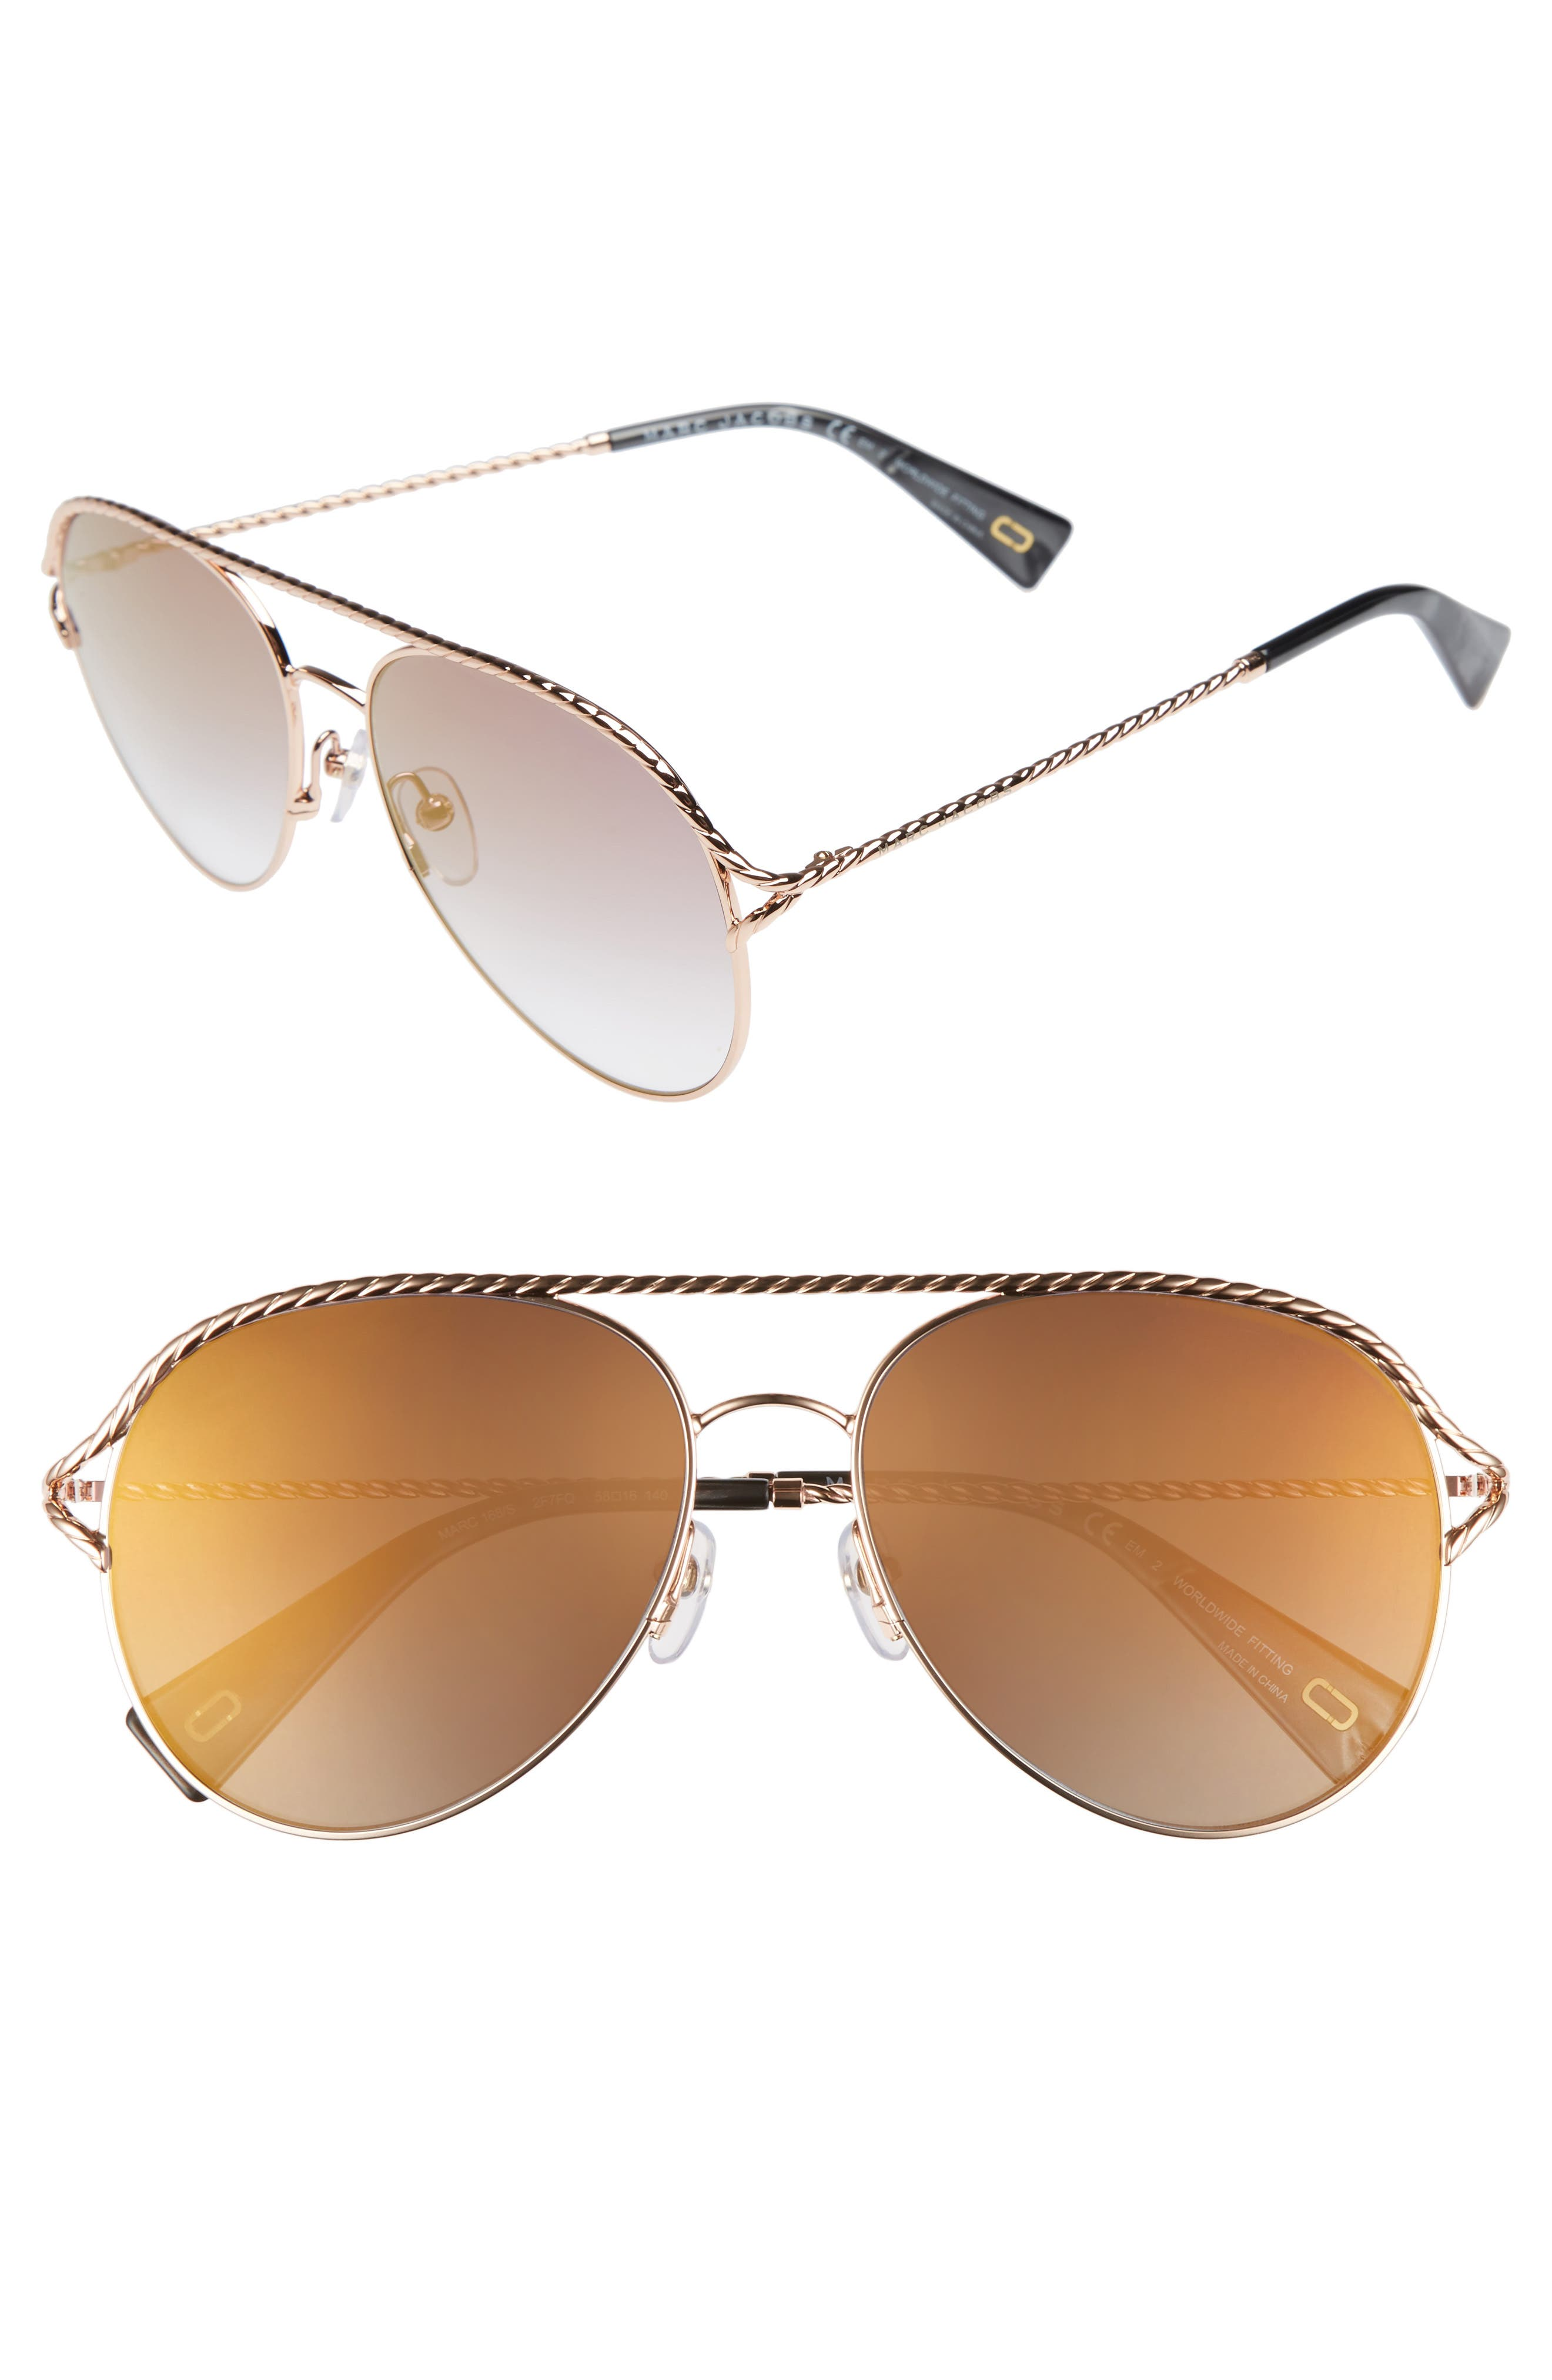 58mm Aviator Sunglasses,                         Main,                         color, Antique Gold Green